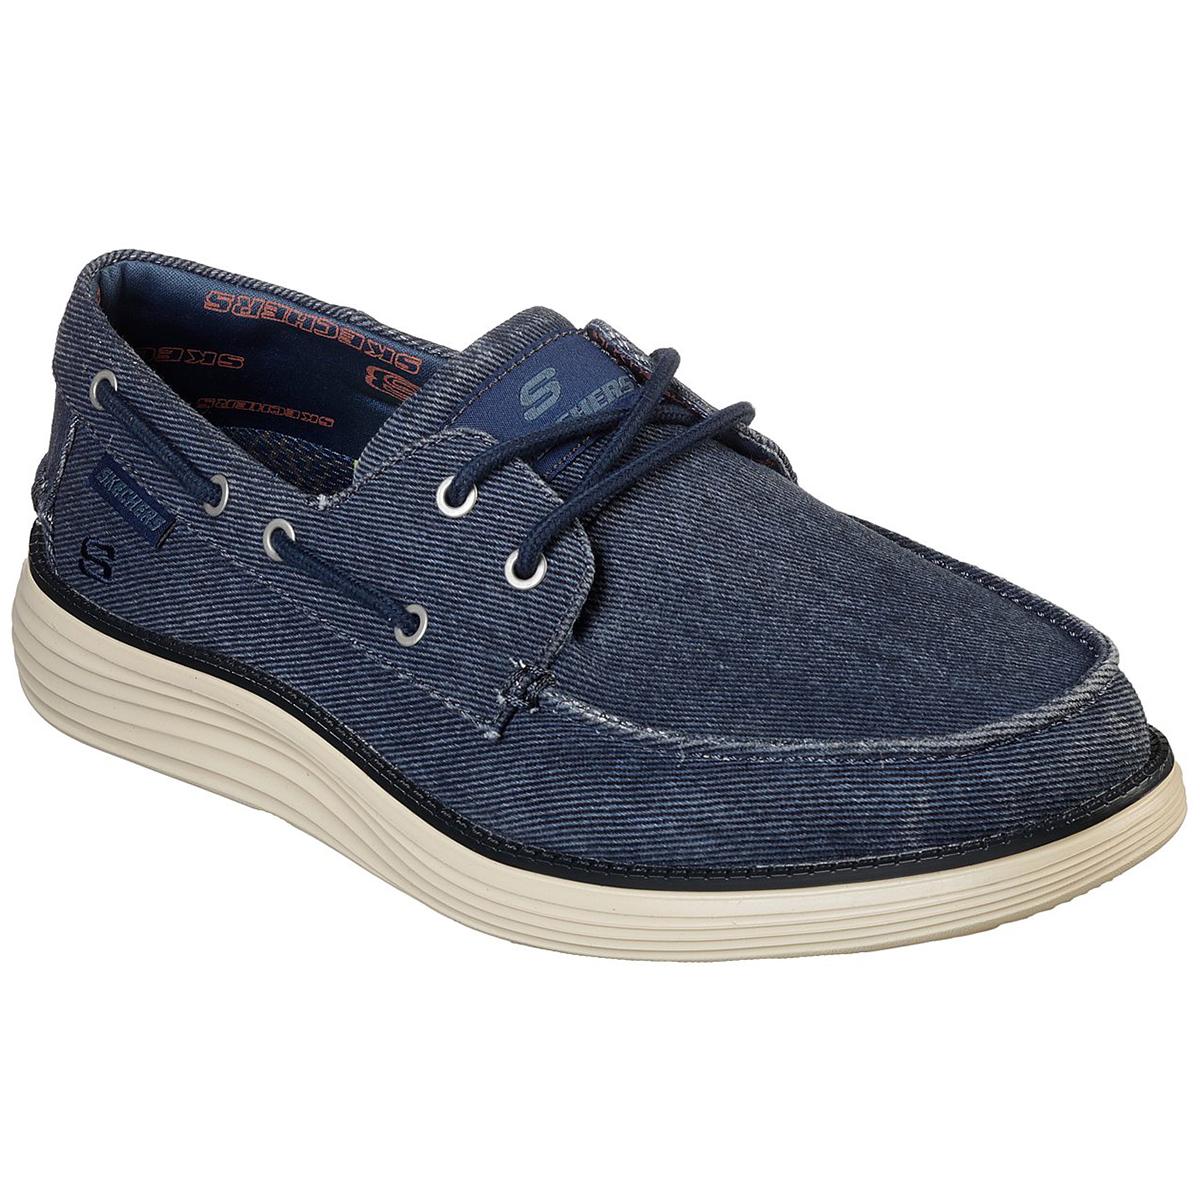 Skechers Men's Status 2.0 Lorano Moc Toe Canvas Shoes - Blue, 9.5